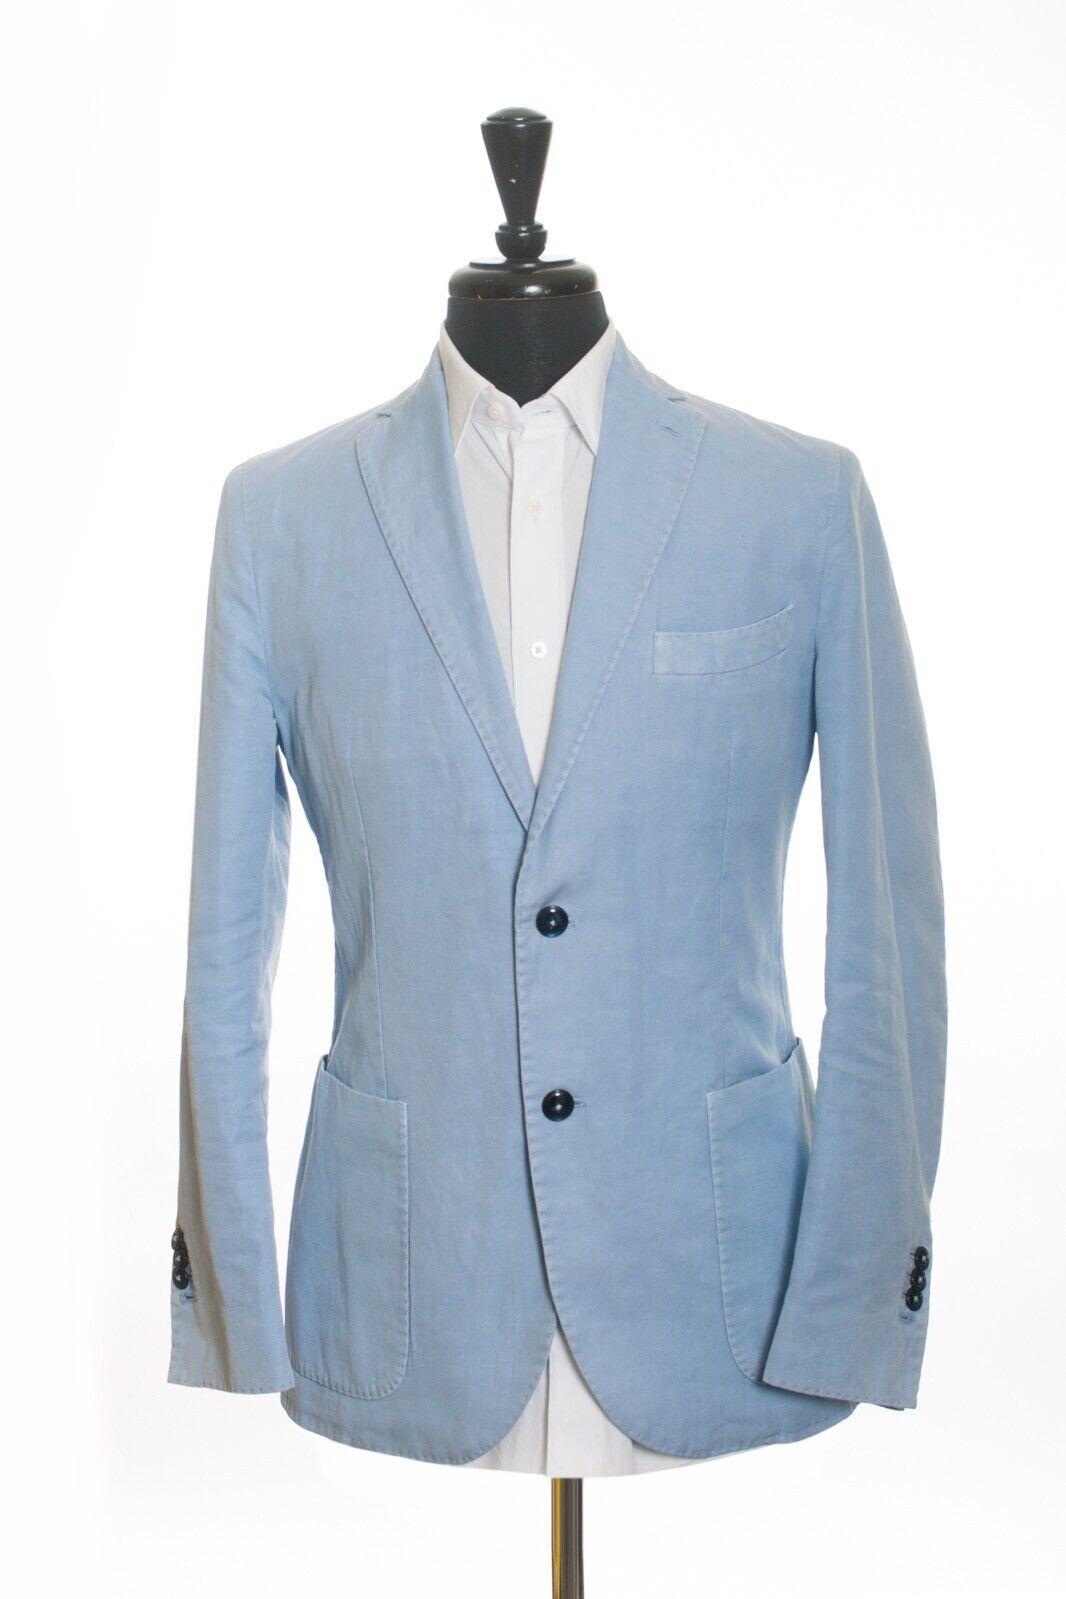 LBM 1911 Light bluee Cotton Blazer 40R 11728